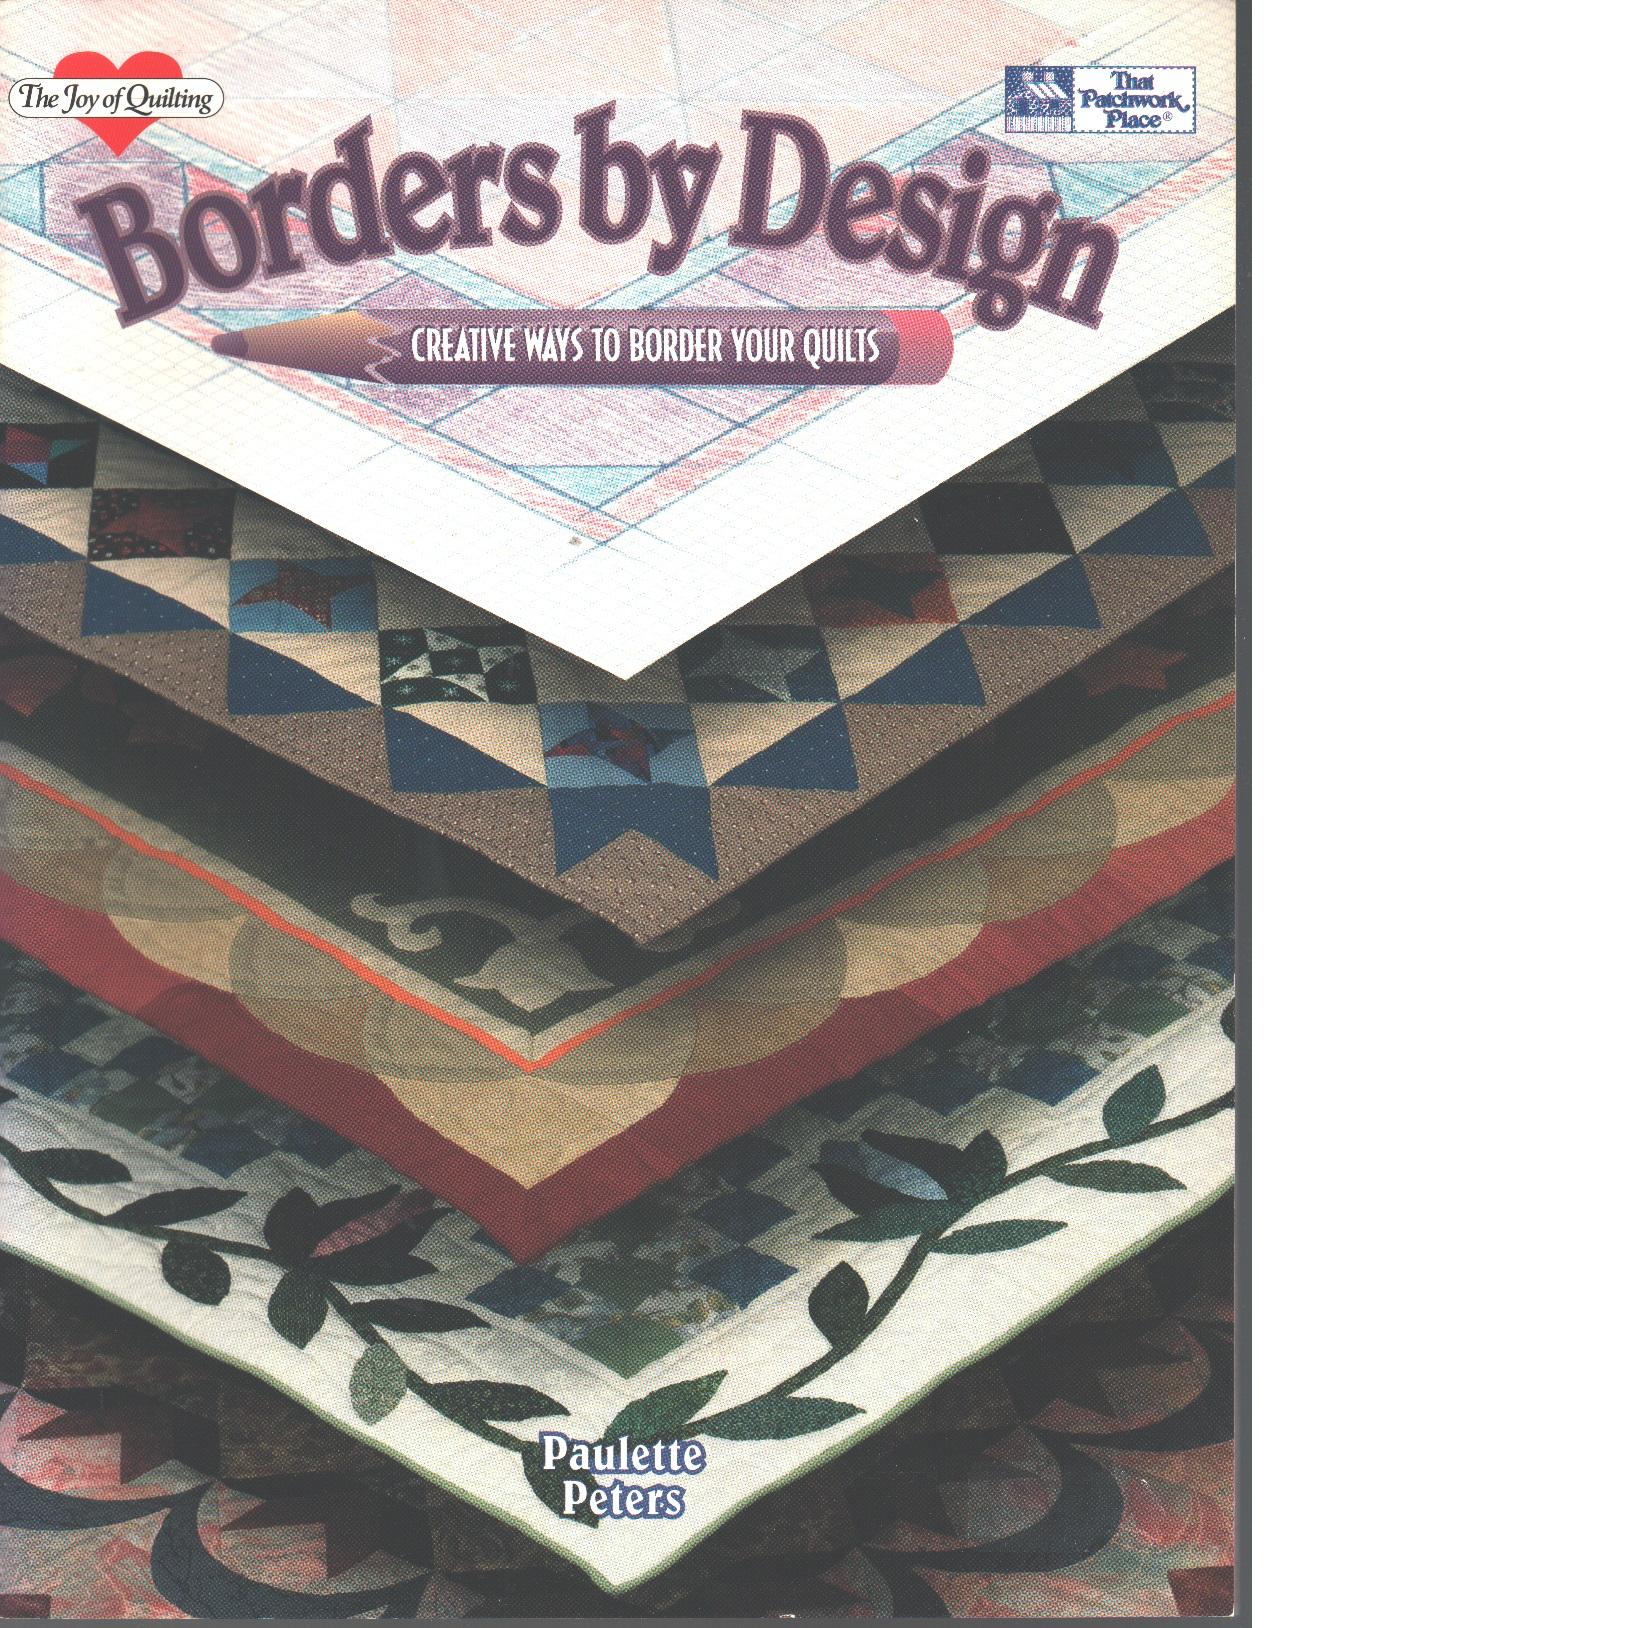 Borders by Design - Peters, Paulette